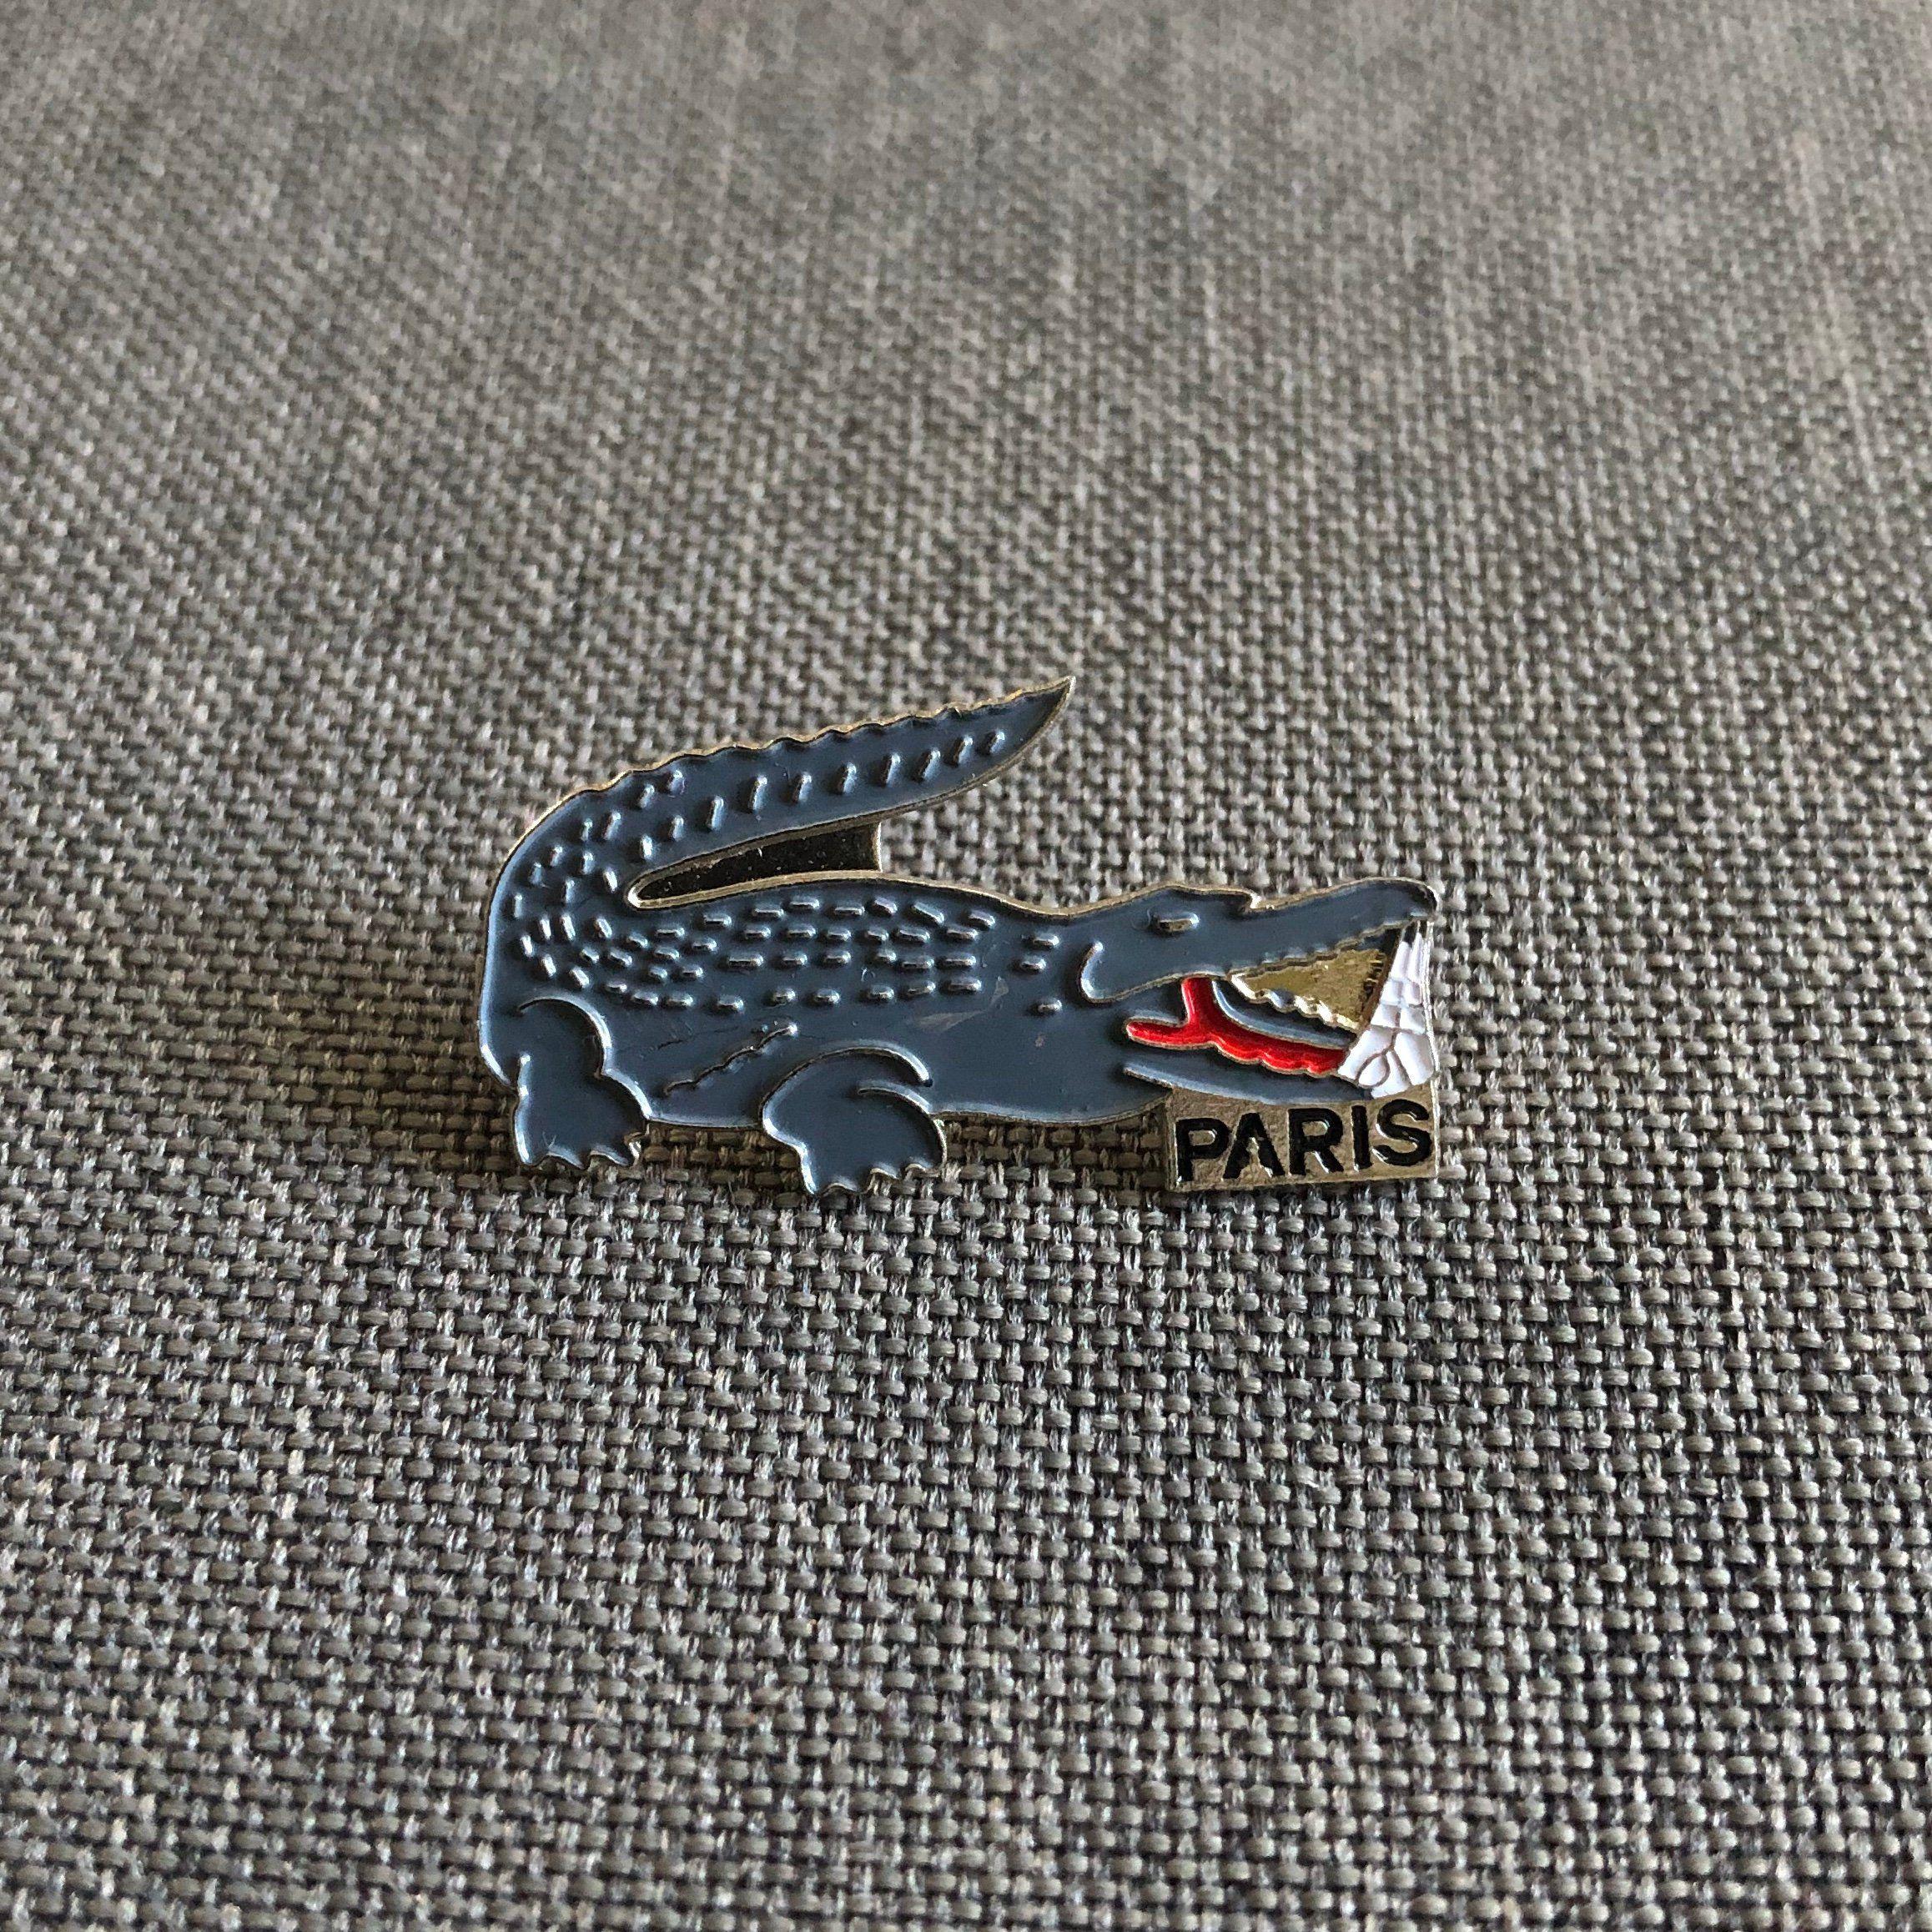 Vintage Enamel Pins Worldwide Shipping Vintage Lacoste Crocodile Paris Enamel Pin Badge French Desig Enamel Pin Badge Vintage Pins Enamel Pins